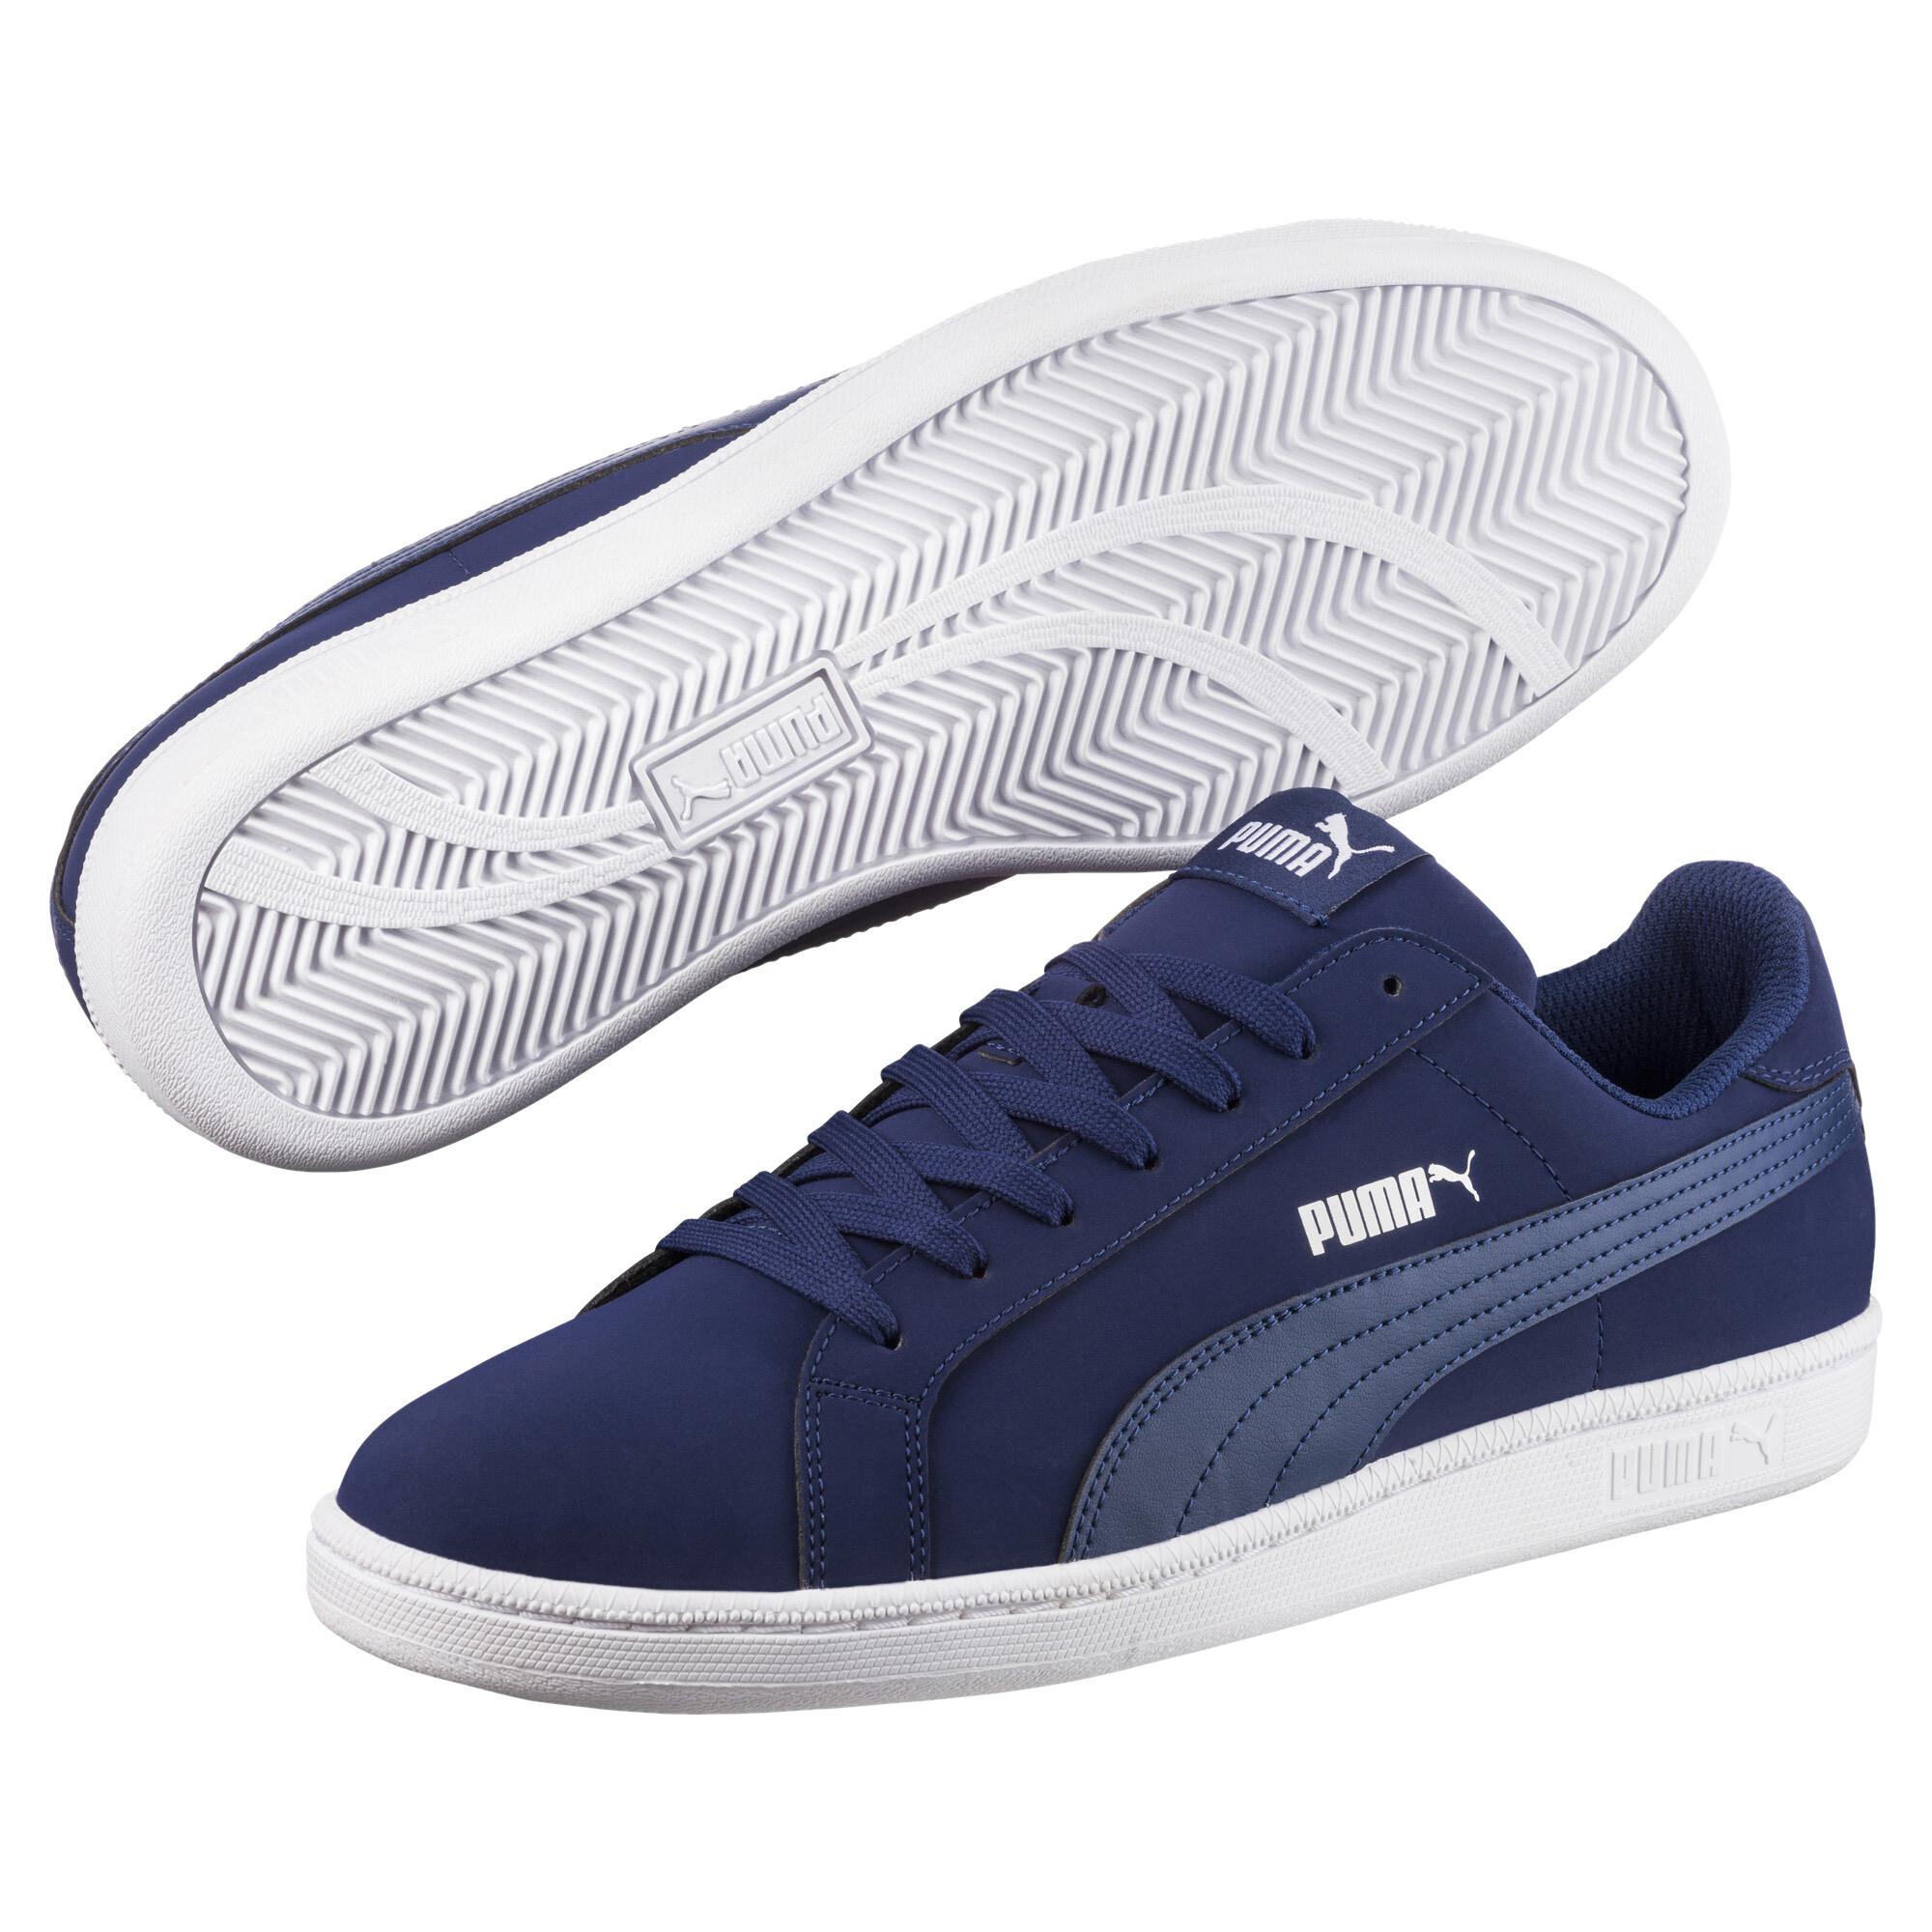 Indexbild 2 - PUMA Smash Buck Sneaker Unisex Schuhe Sport Classics Neu